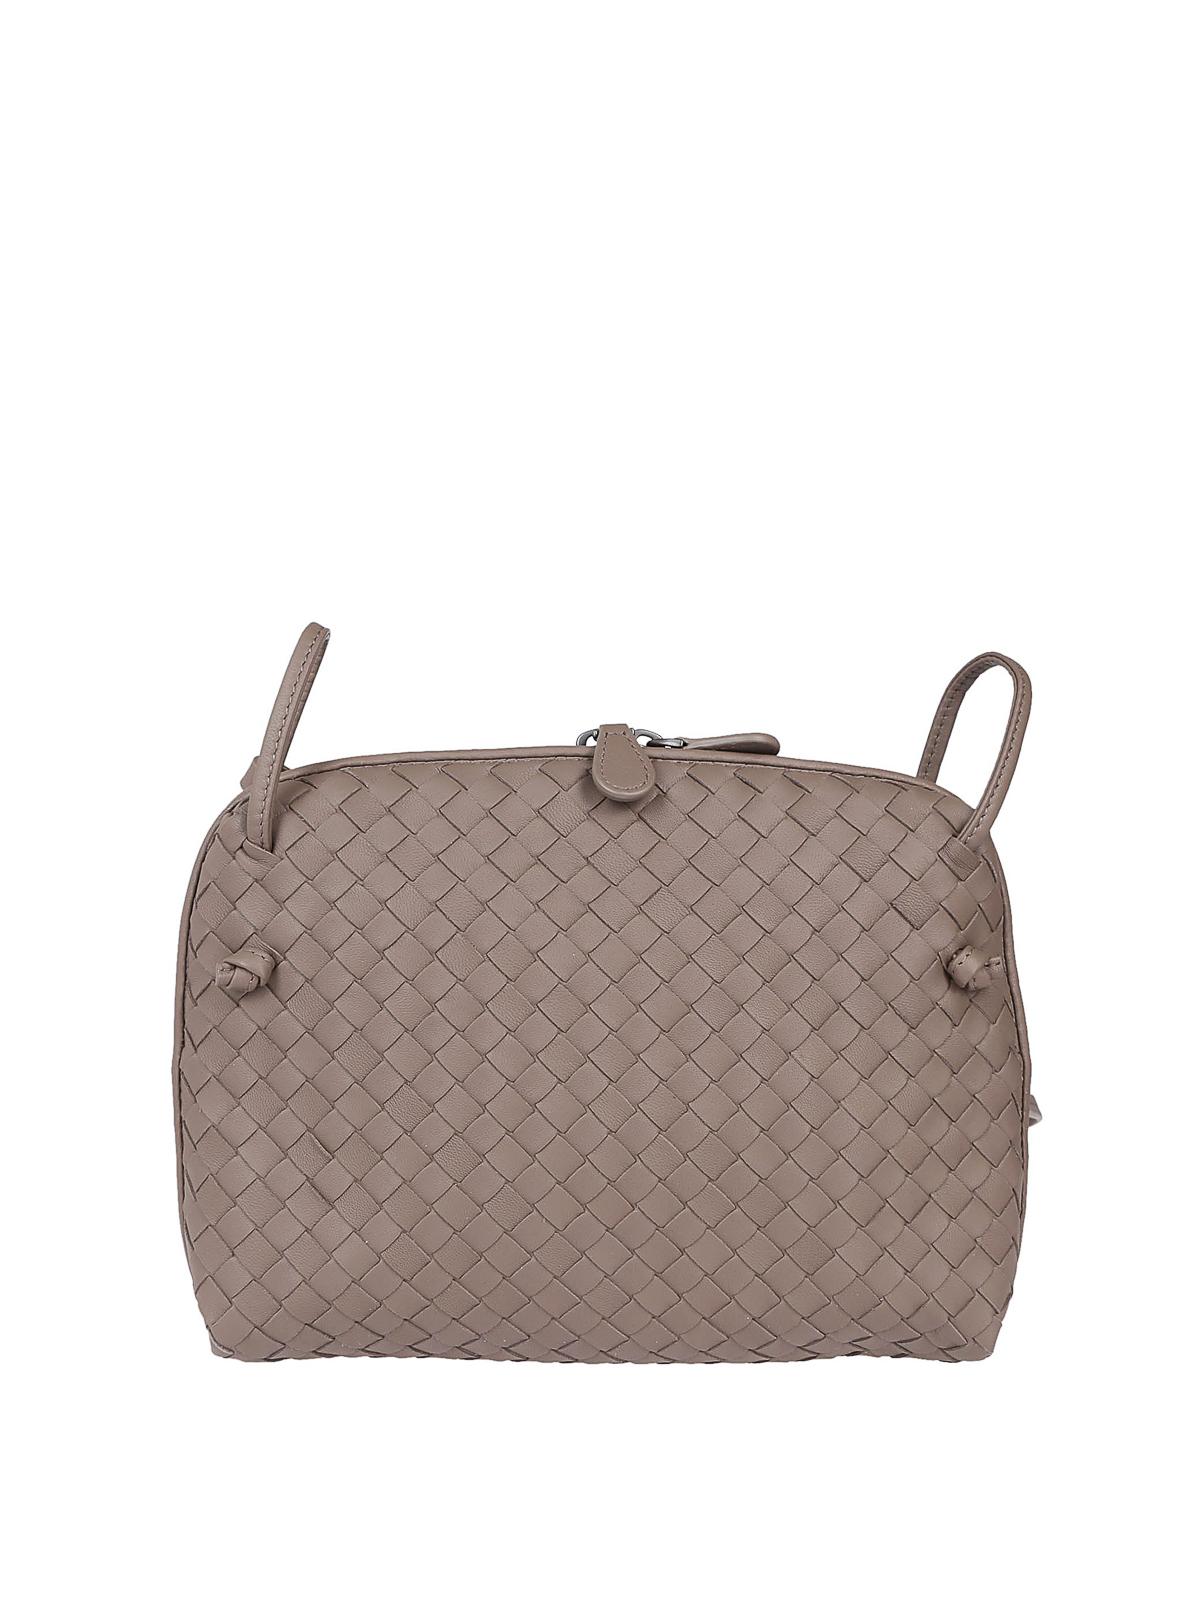 2db8f5f49275 BOTTEGA VENETA  cross body bags - Nodini intrecciato nappa cross body bag